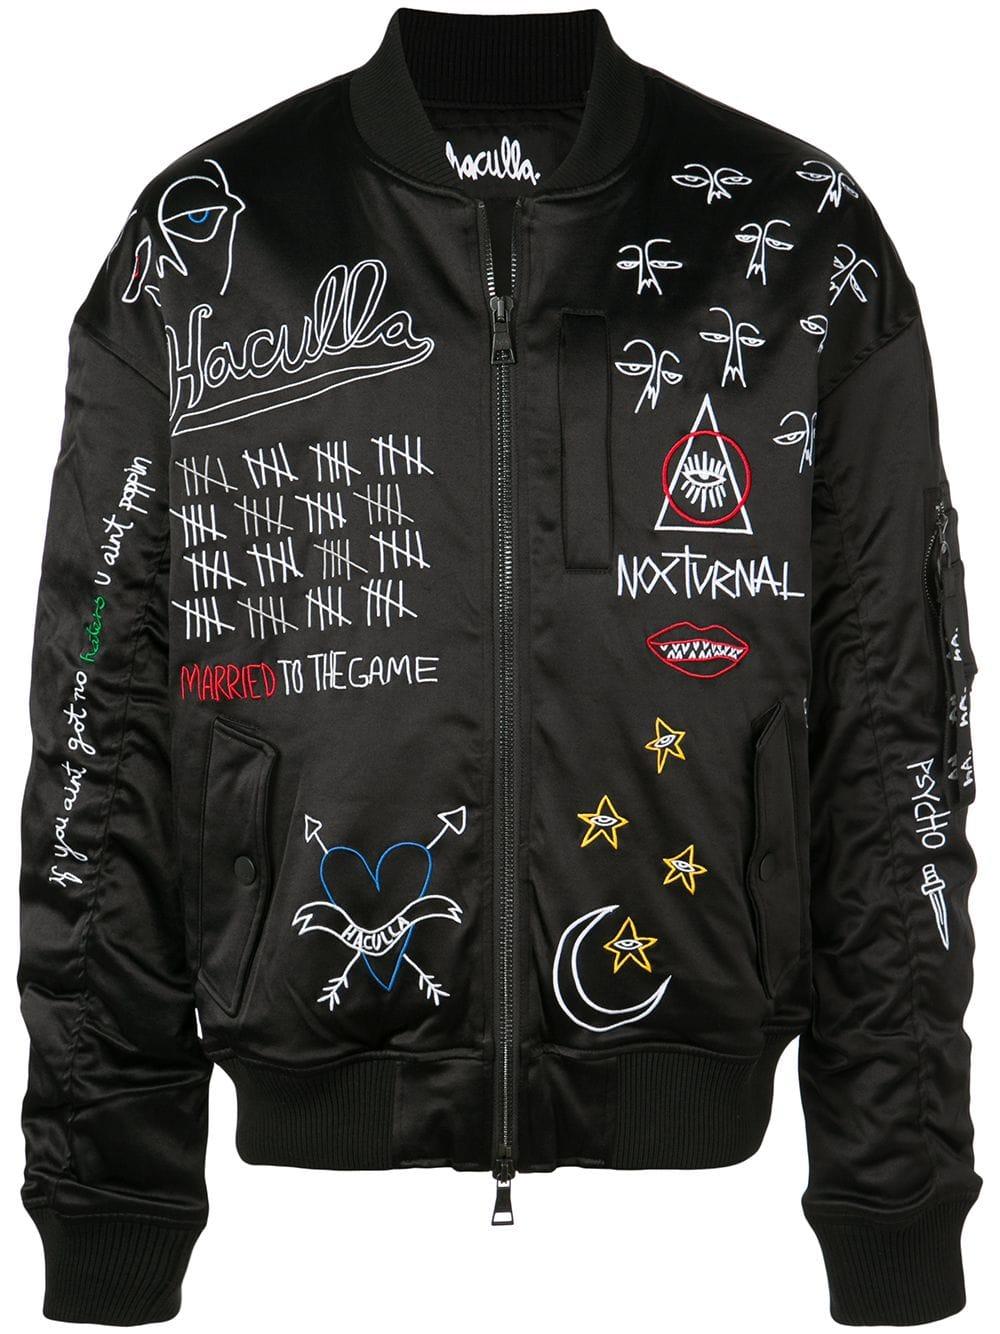 Haculla Nocturnal Bomber Jacket In Black Modesens Bomber Jacket Black Bomber Jacket Painted Leather Jacket [ 1334 x 1000 Pixel ]